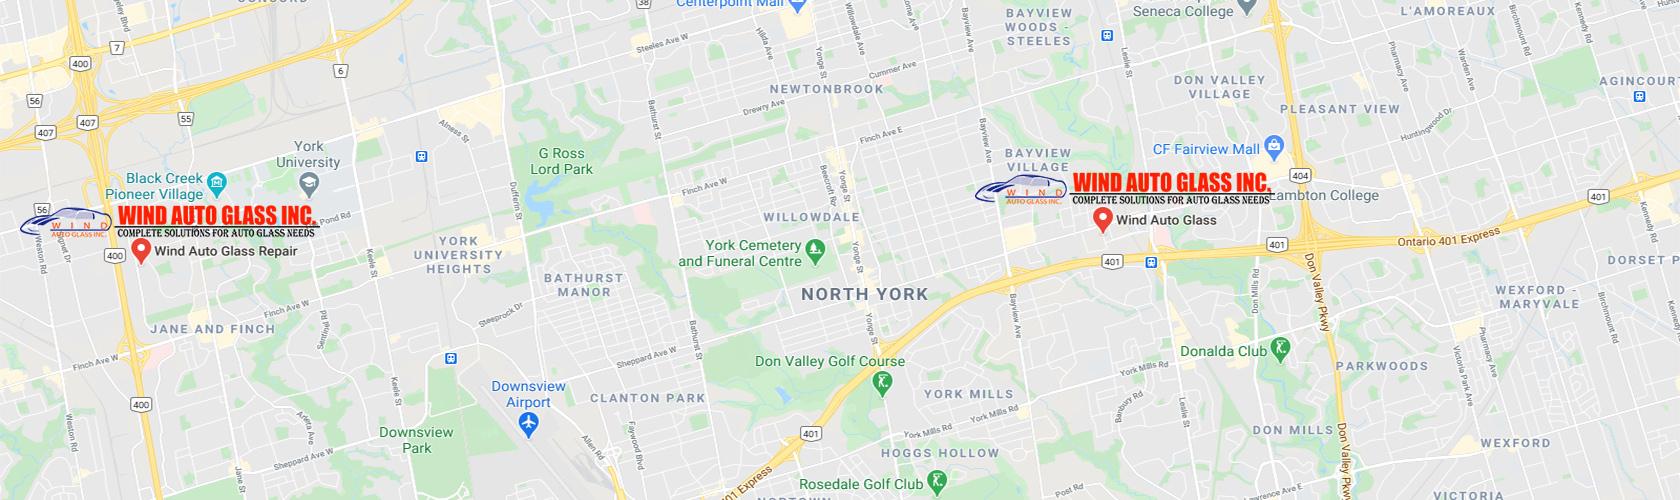 Wind Auto Glass - Serving North York, Vaughan, Scarborough, Markham, Richmond Hill, Brampton, Mississauga, Toronto